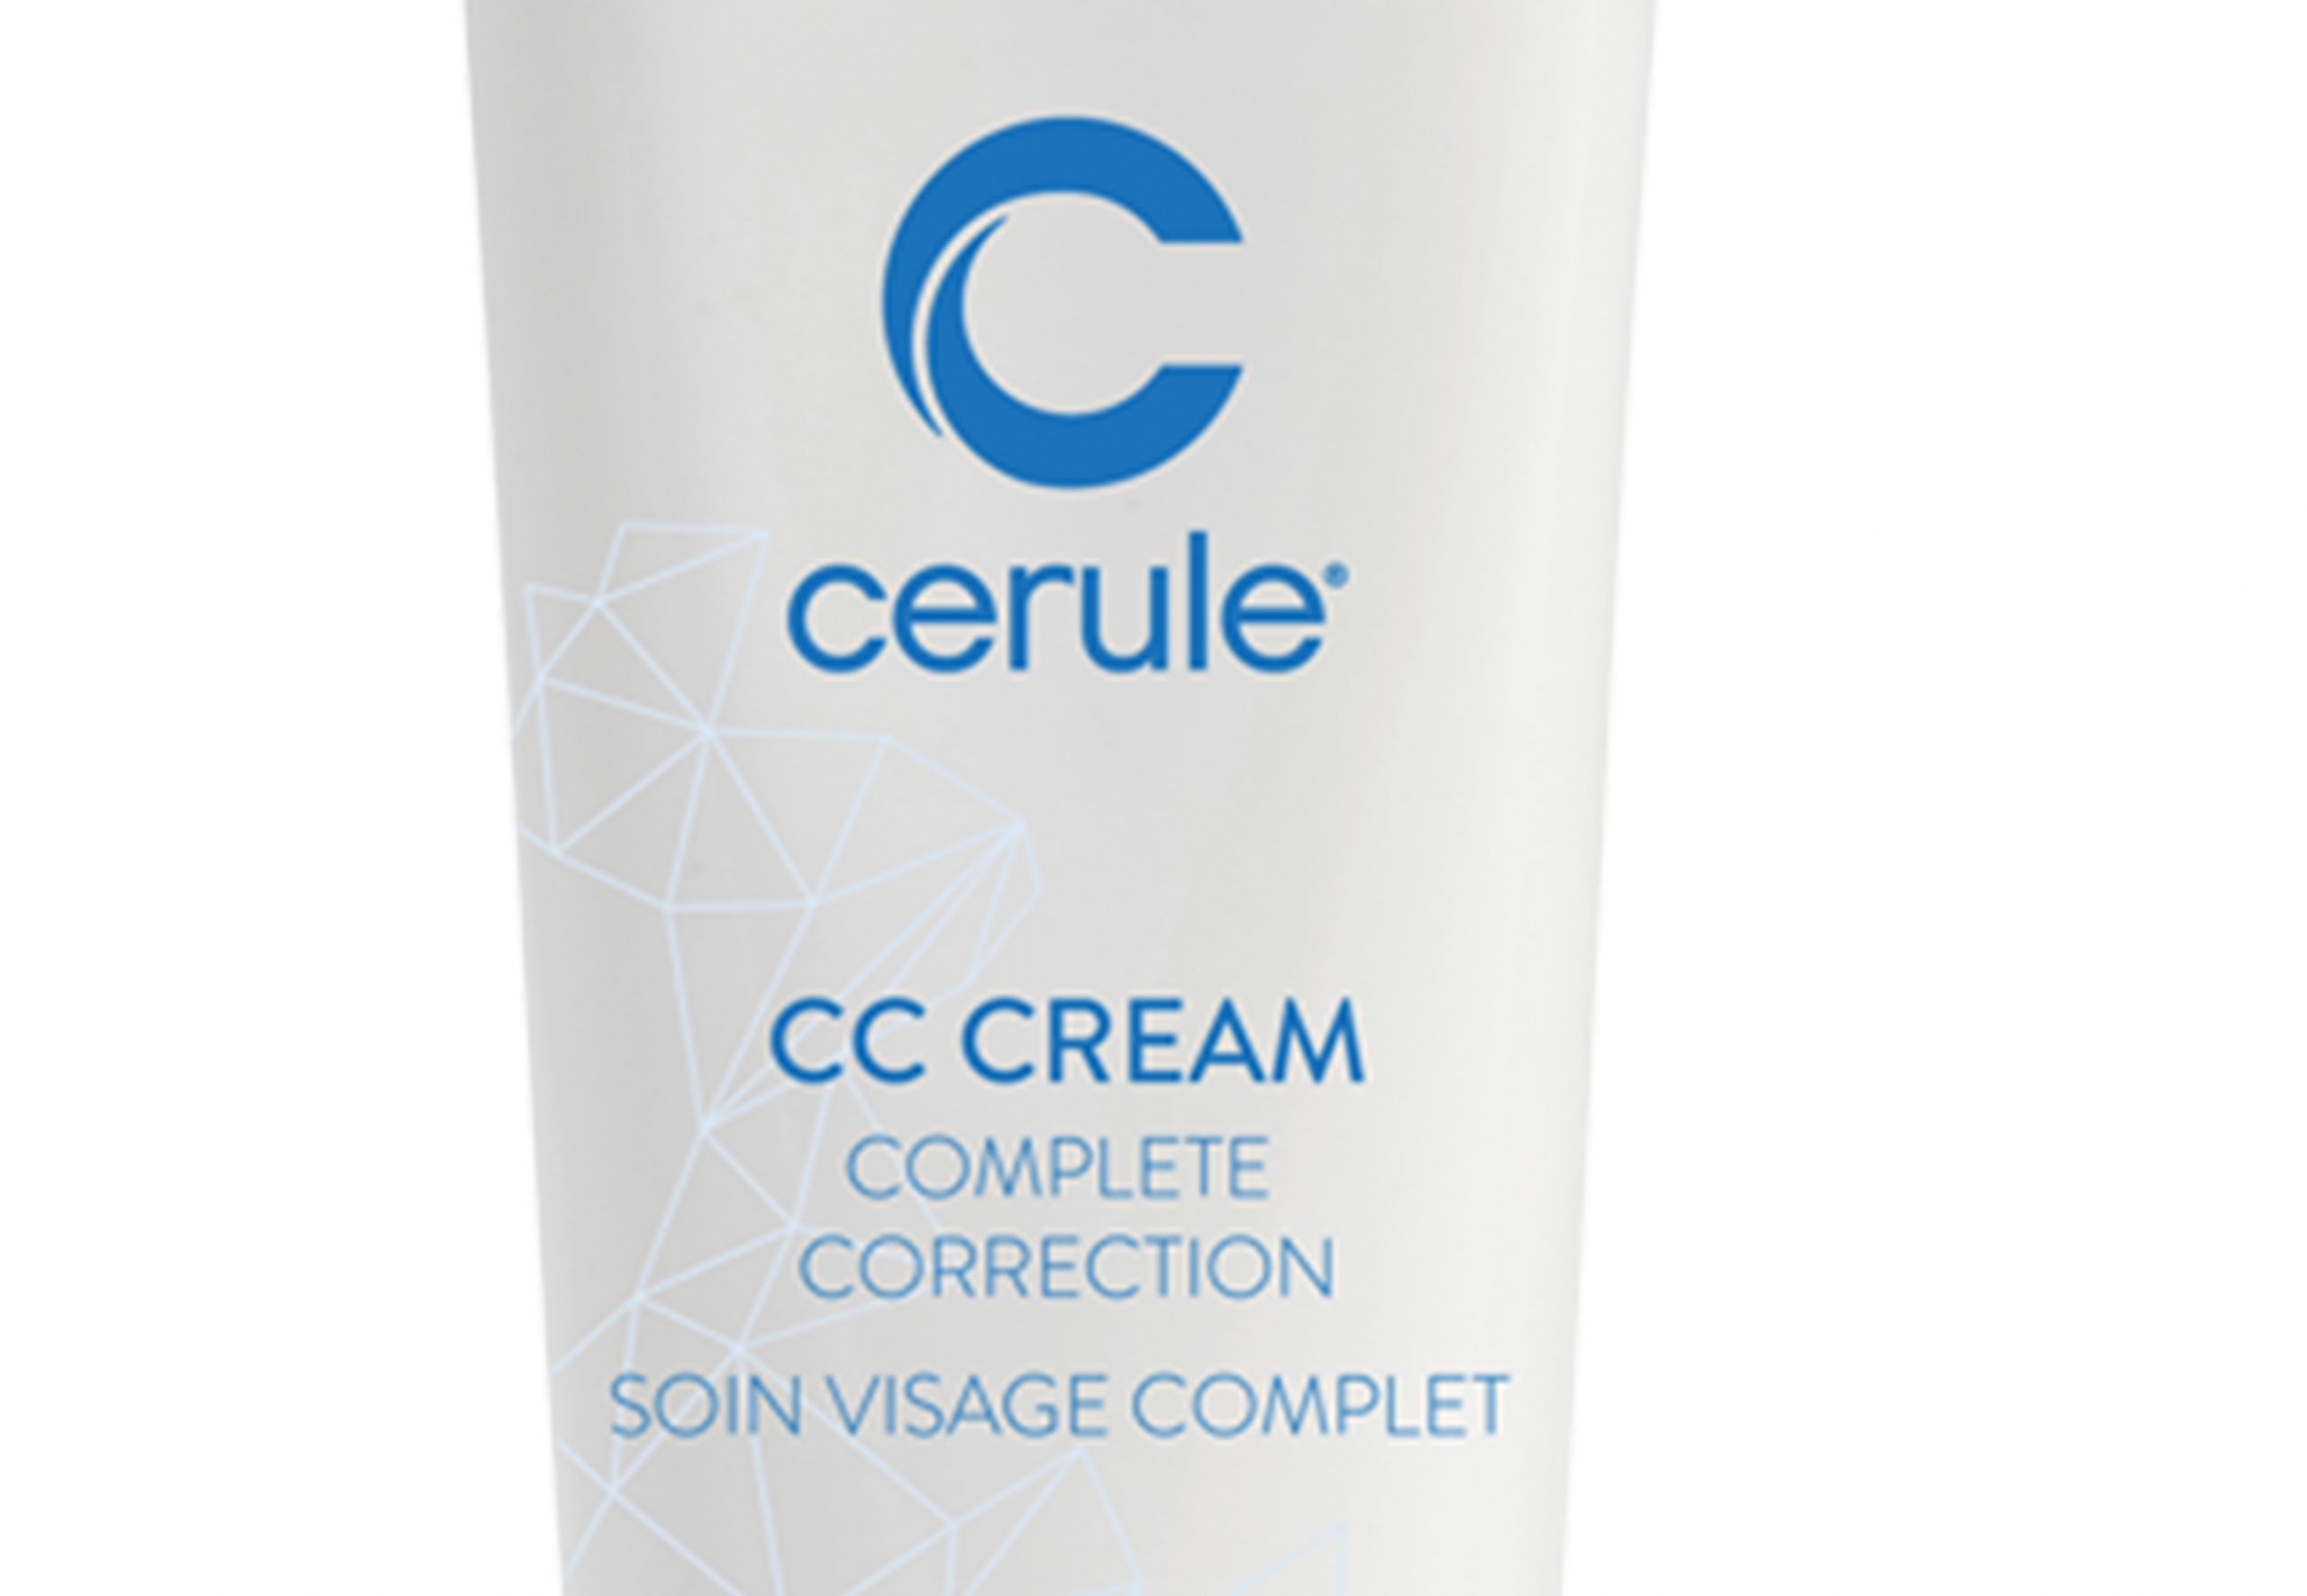 cerule CC cream complete cleansing